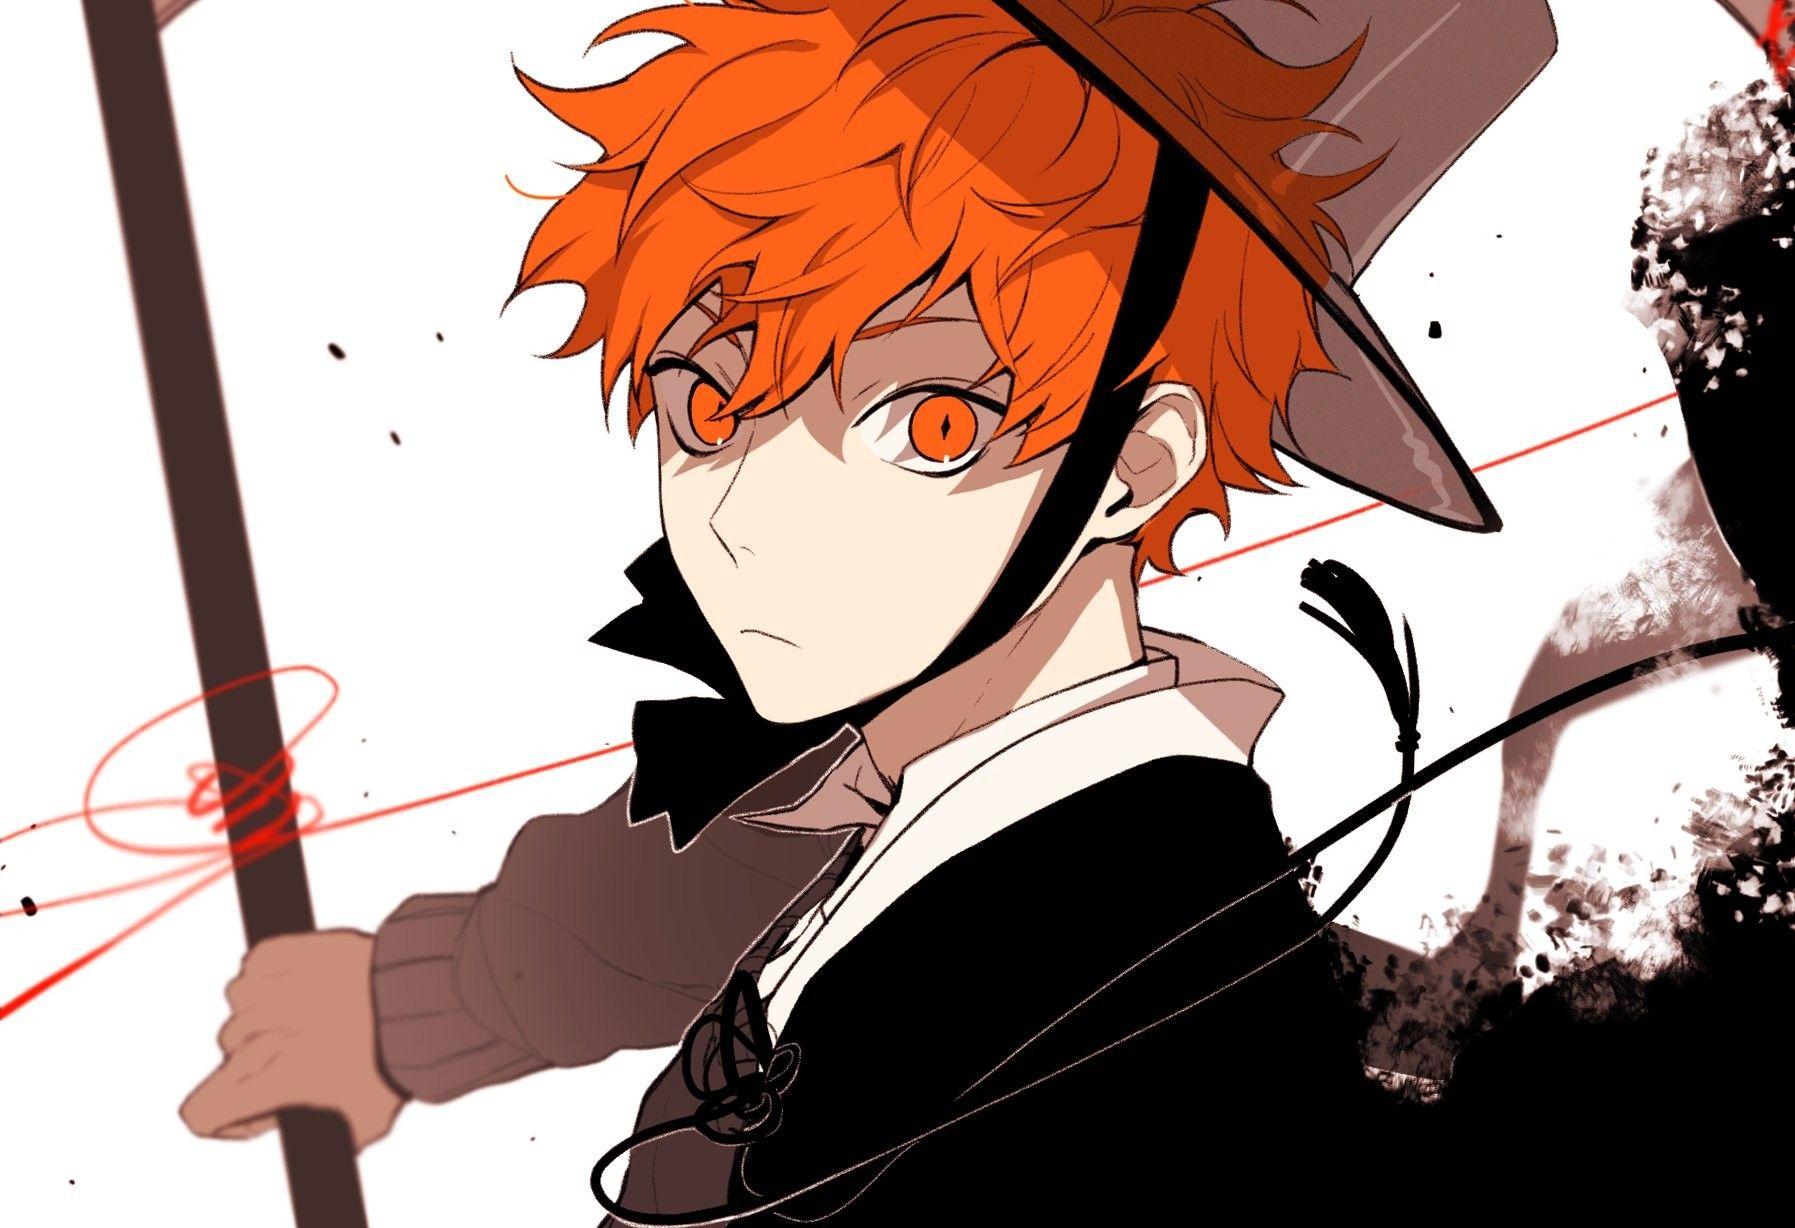 Pin by Robin Rideout on Haikyuu!!° Haikyuu anime